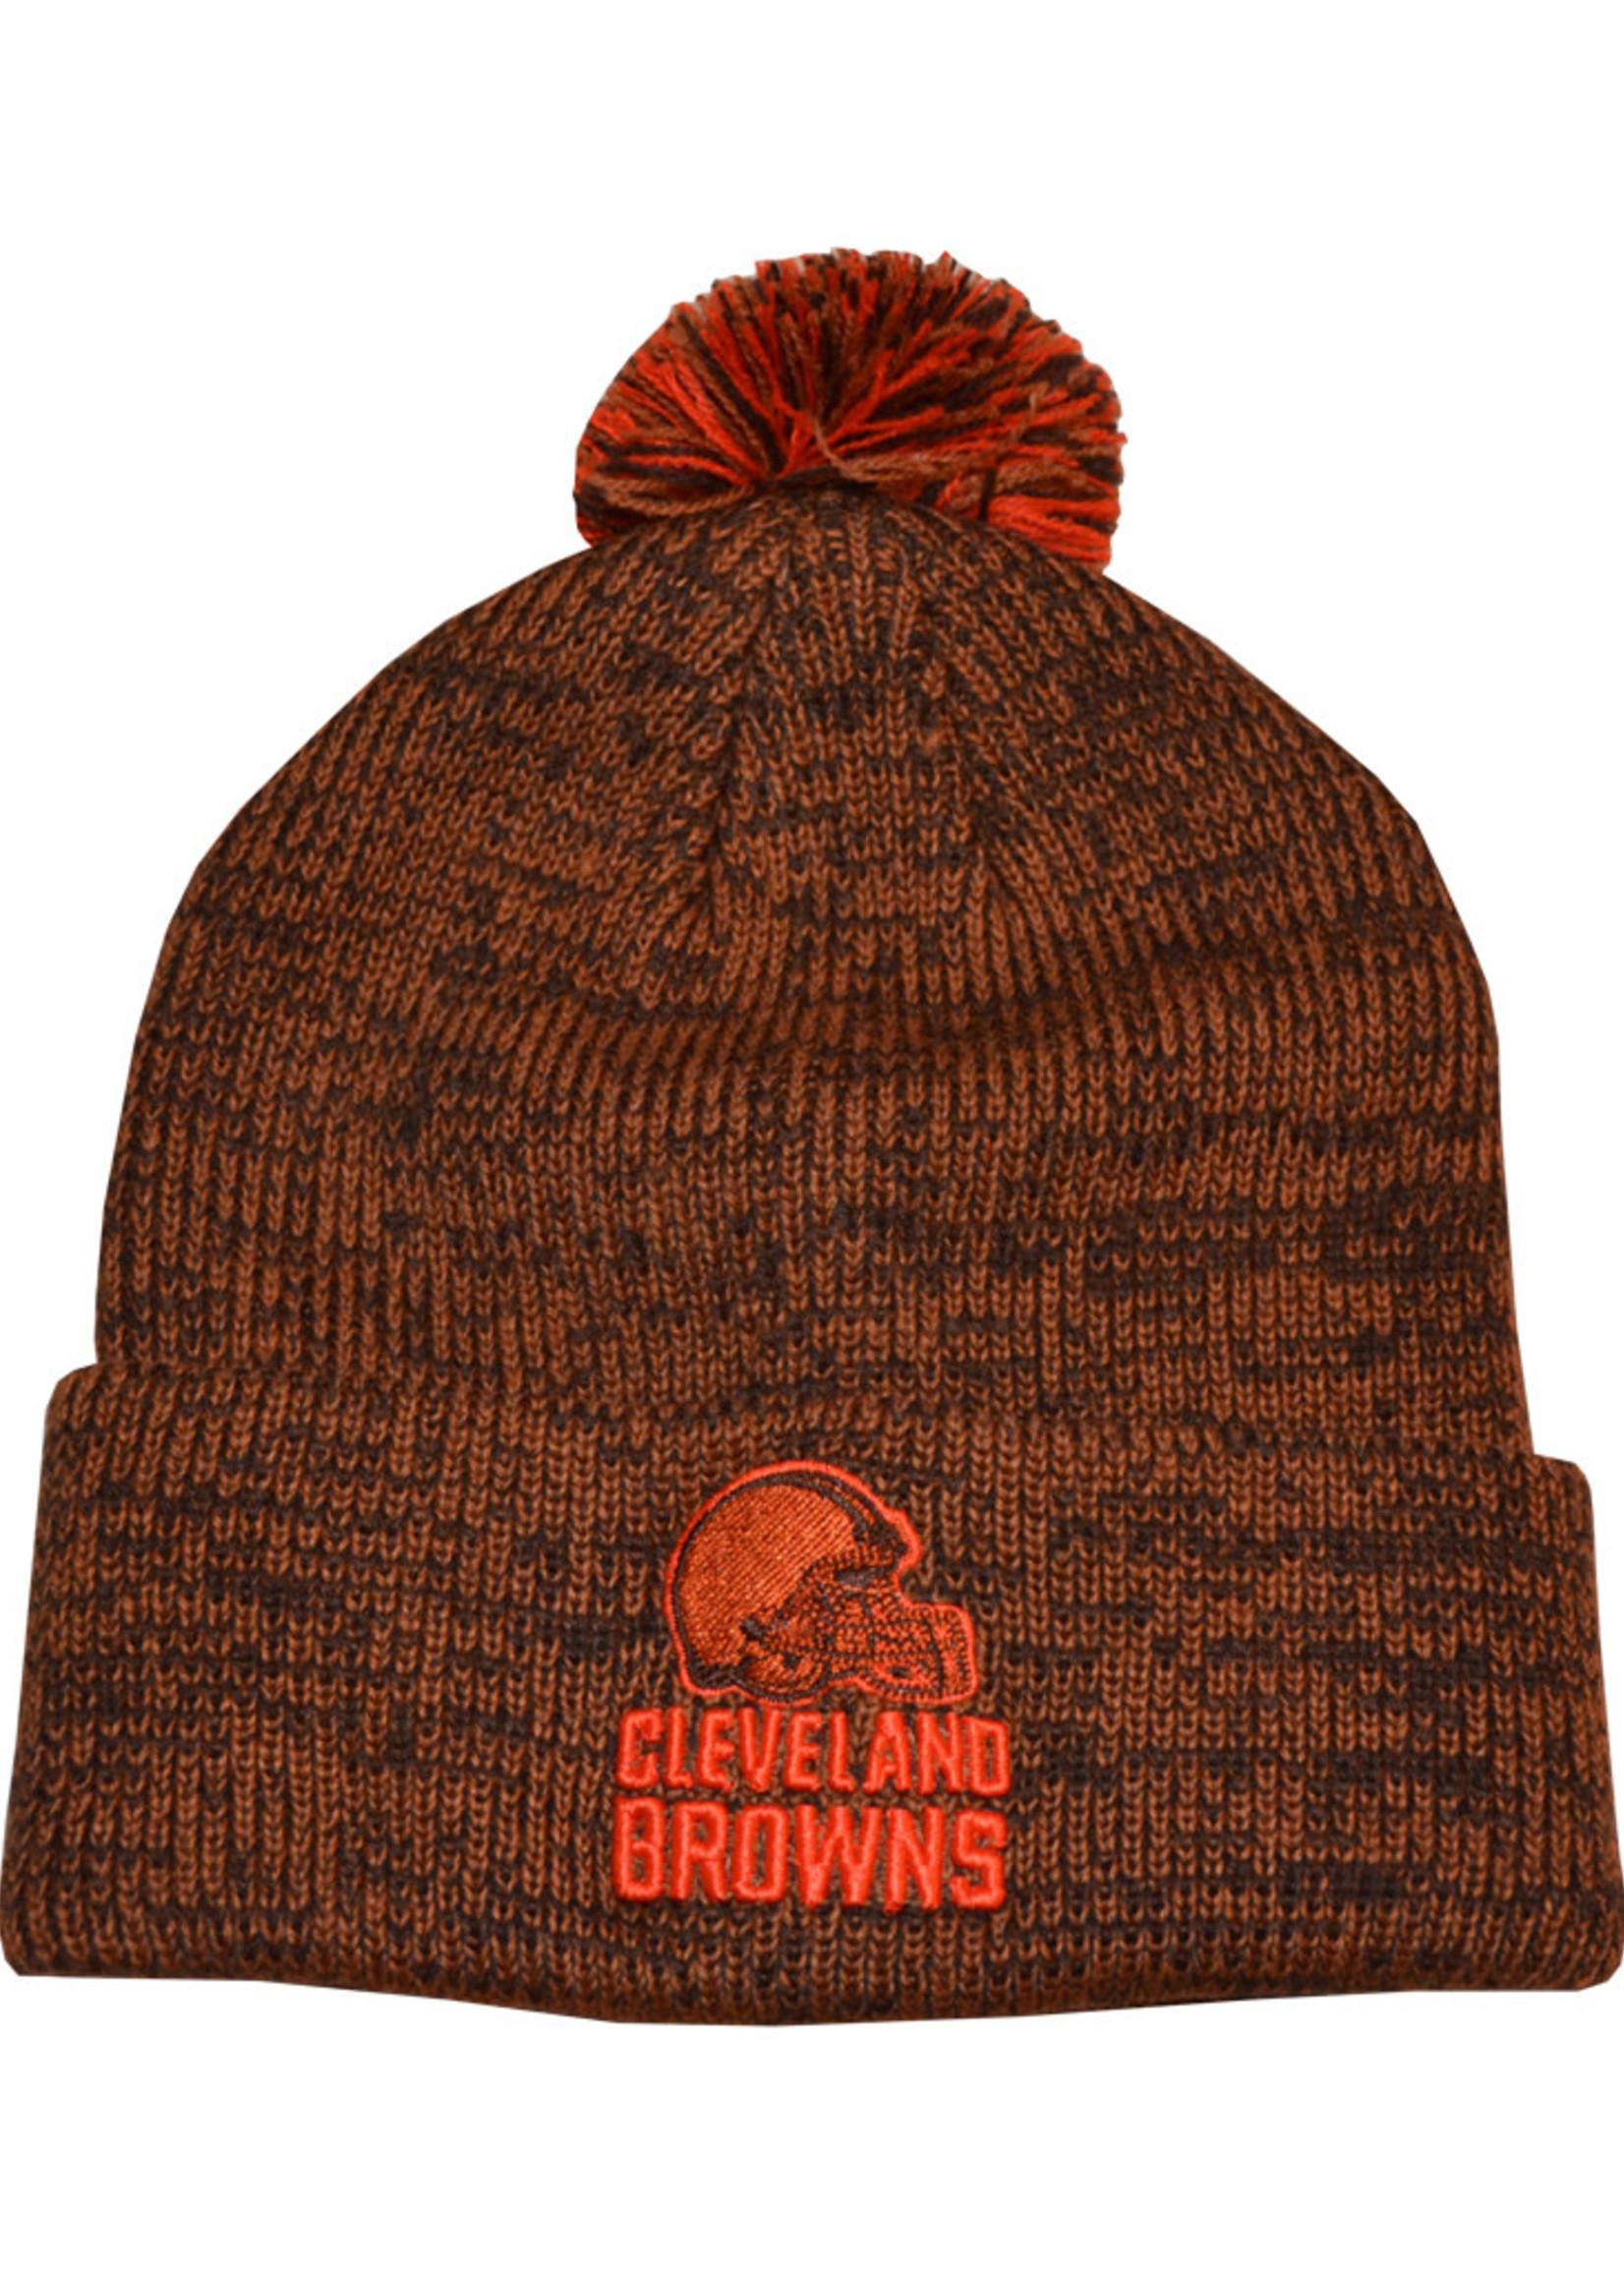 Cleveland Browns Orange and Brown Beanie